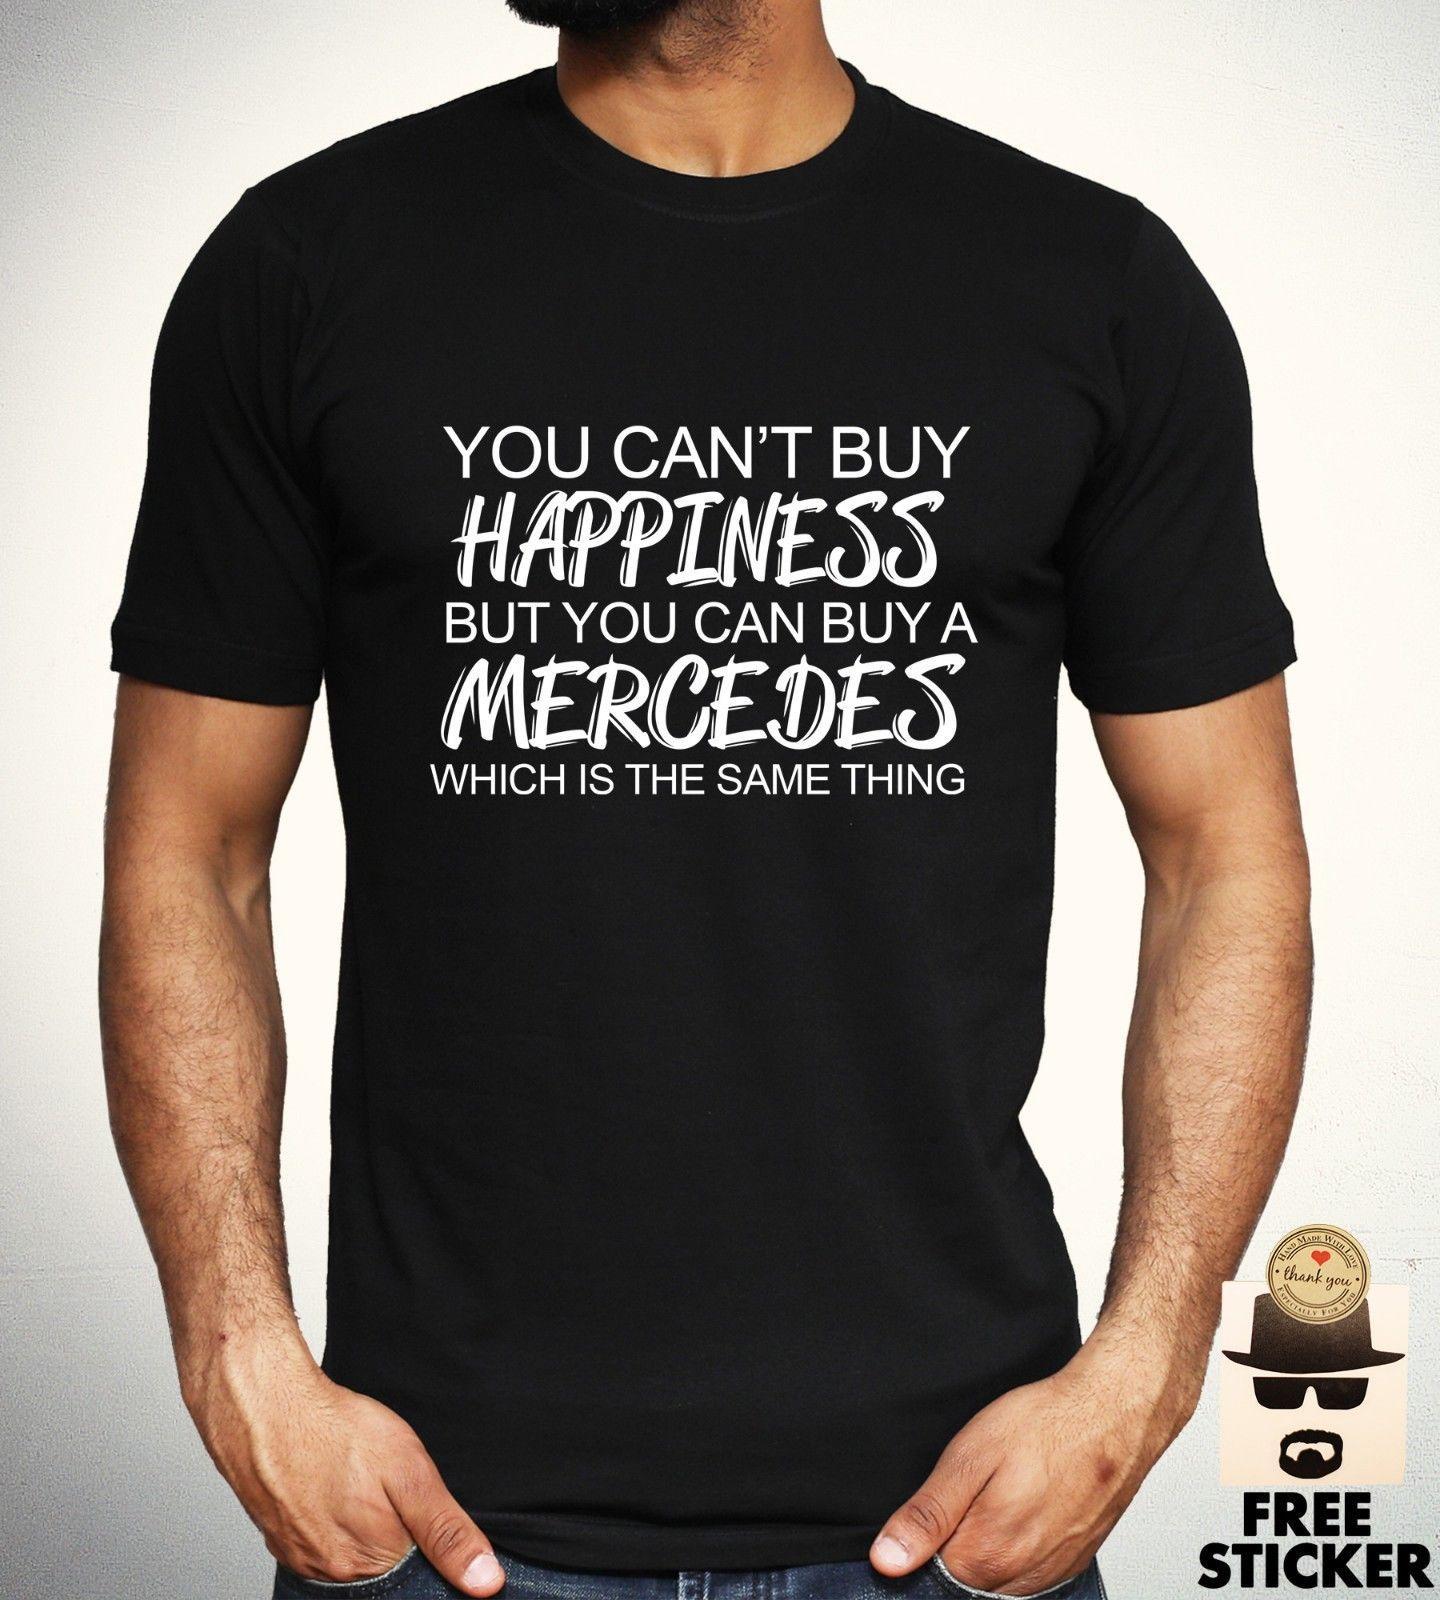 1274689b Mercedes Benz Funny T Shirt Car Sport Racing Tee Mens Clothing Gift Top  100% Cotton Casual Men T Shirt O Neck Printing Short Sleeve Shirt Site  Printing Of T ...